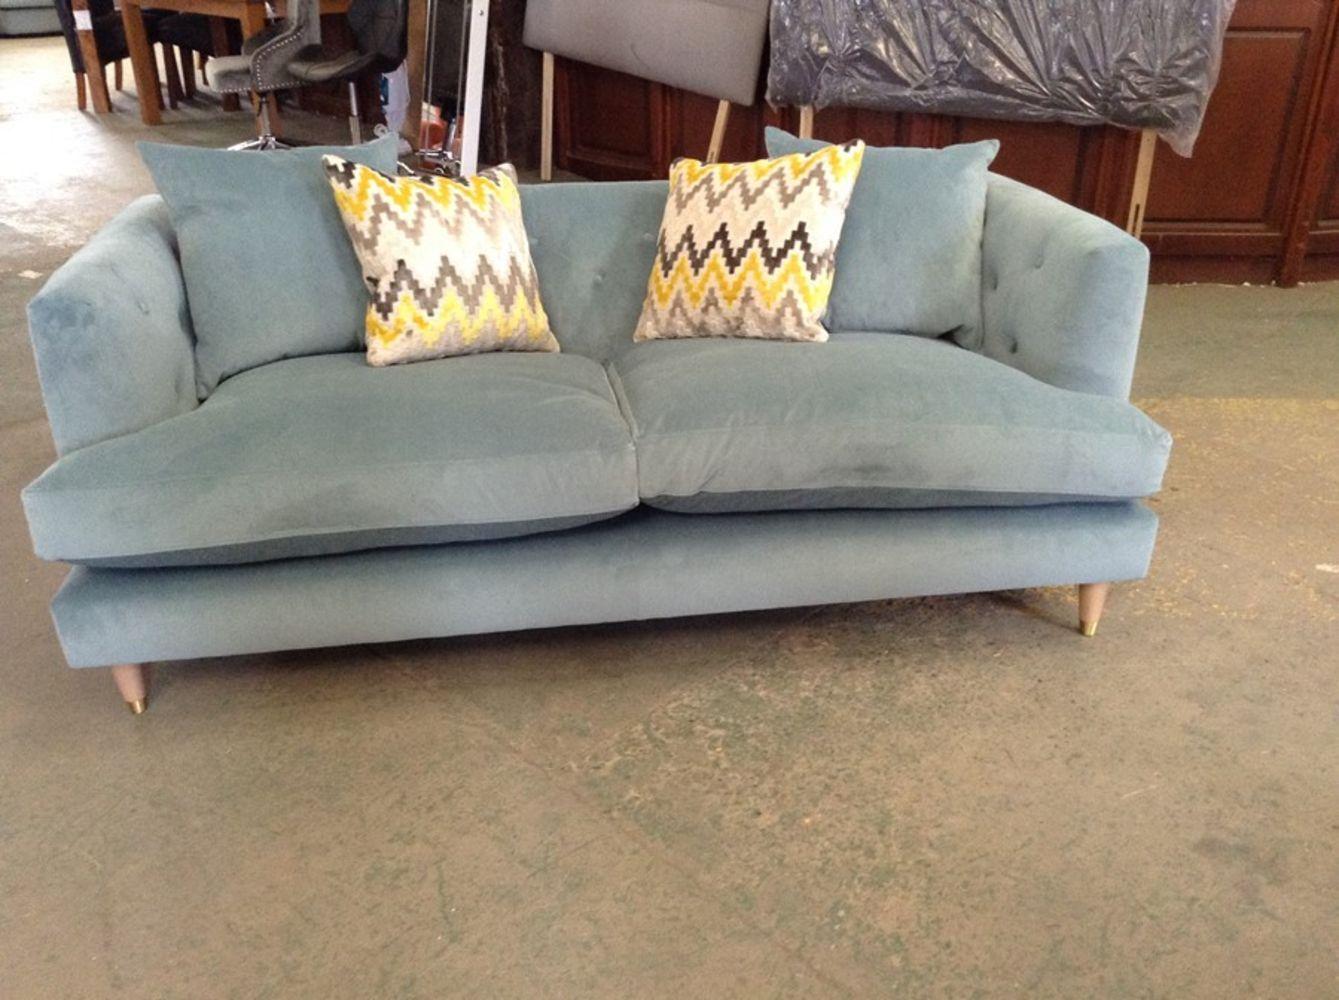 Modern & Antique Furniture Auction inc Top High Street Brands